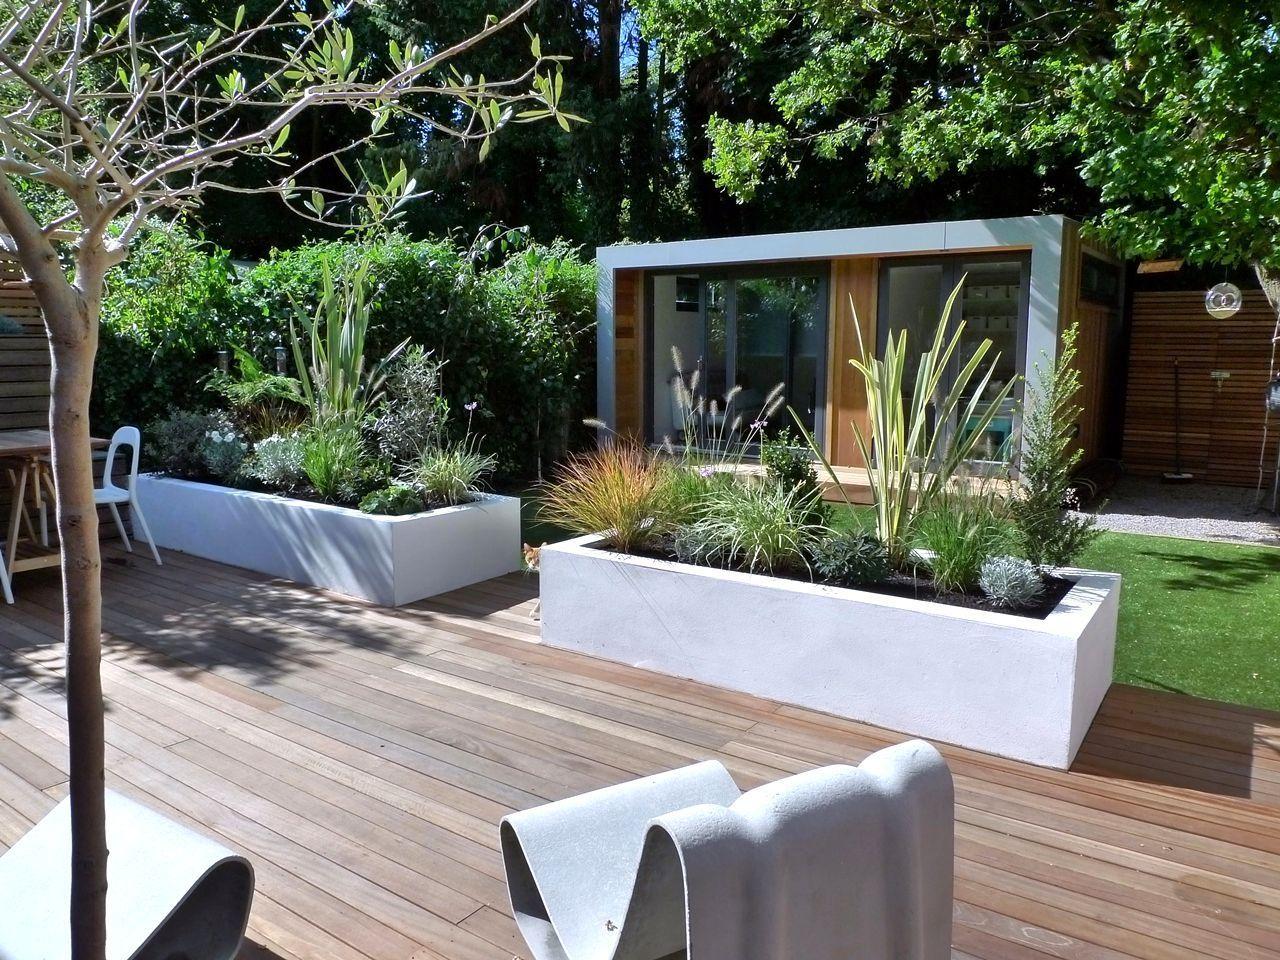 Terraced House Garden Inspiration In 2020 Urban Garden Design Terrace Garden Design Contemporary Garden Design